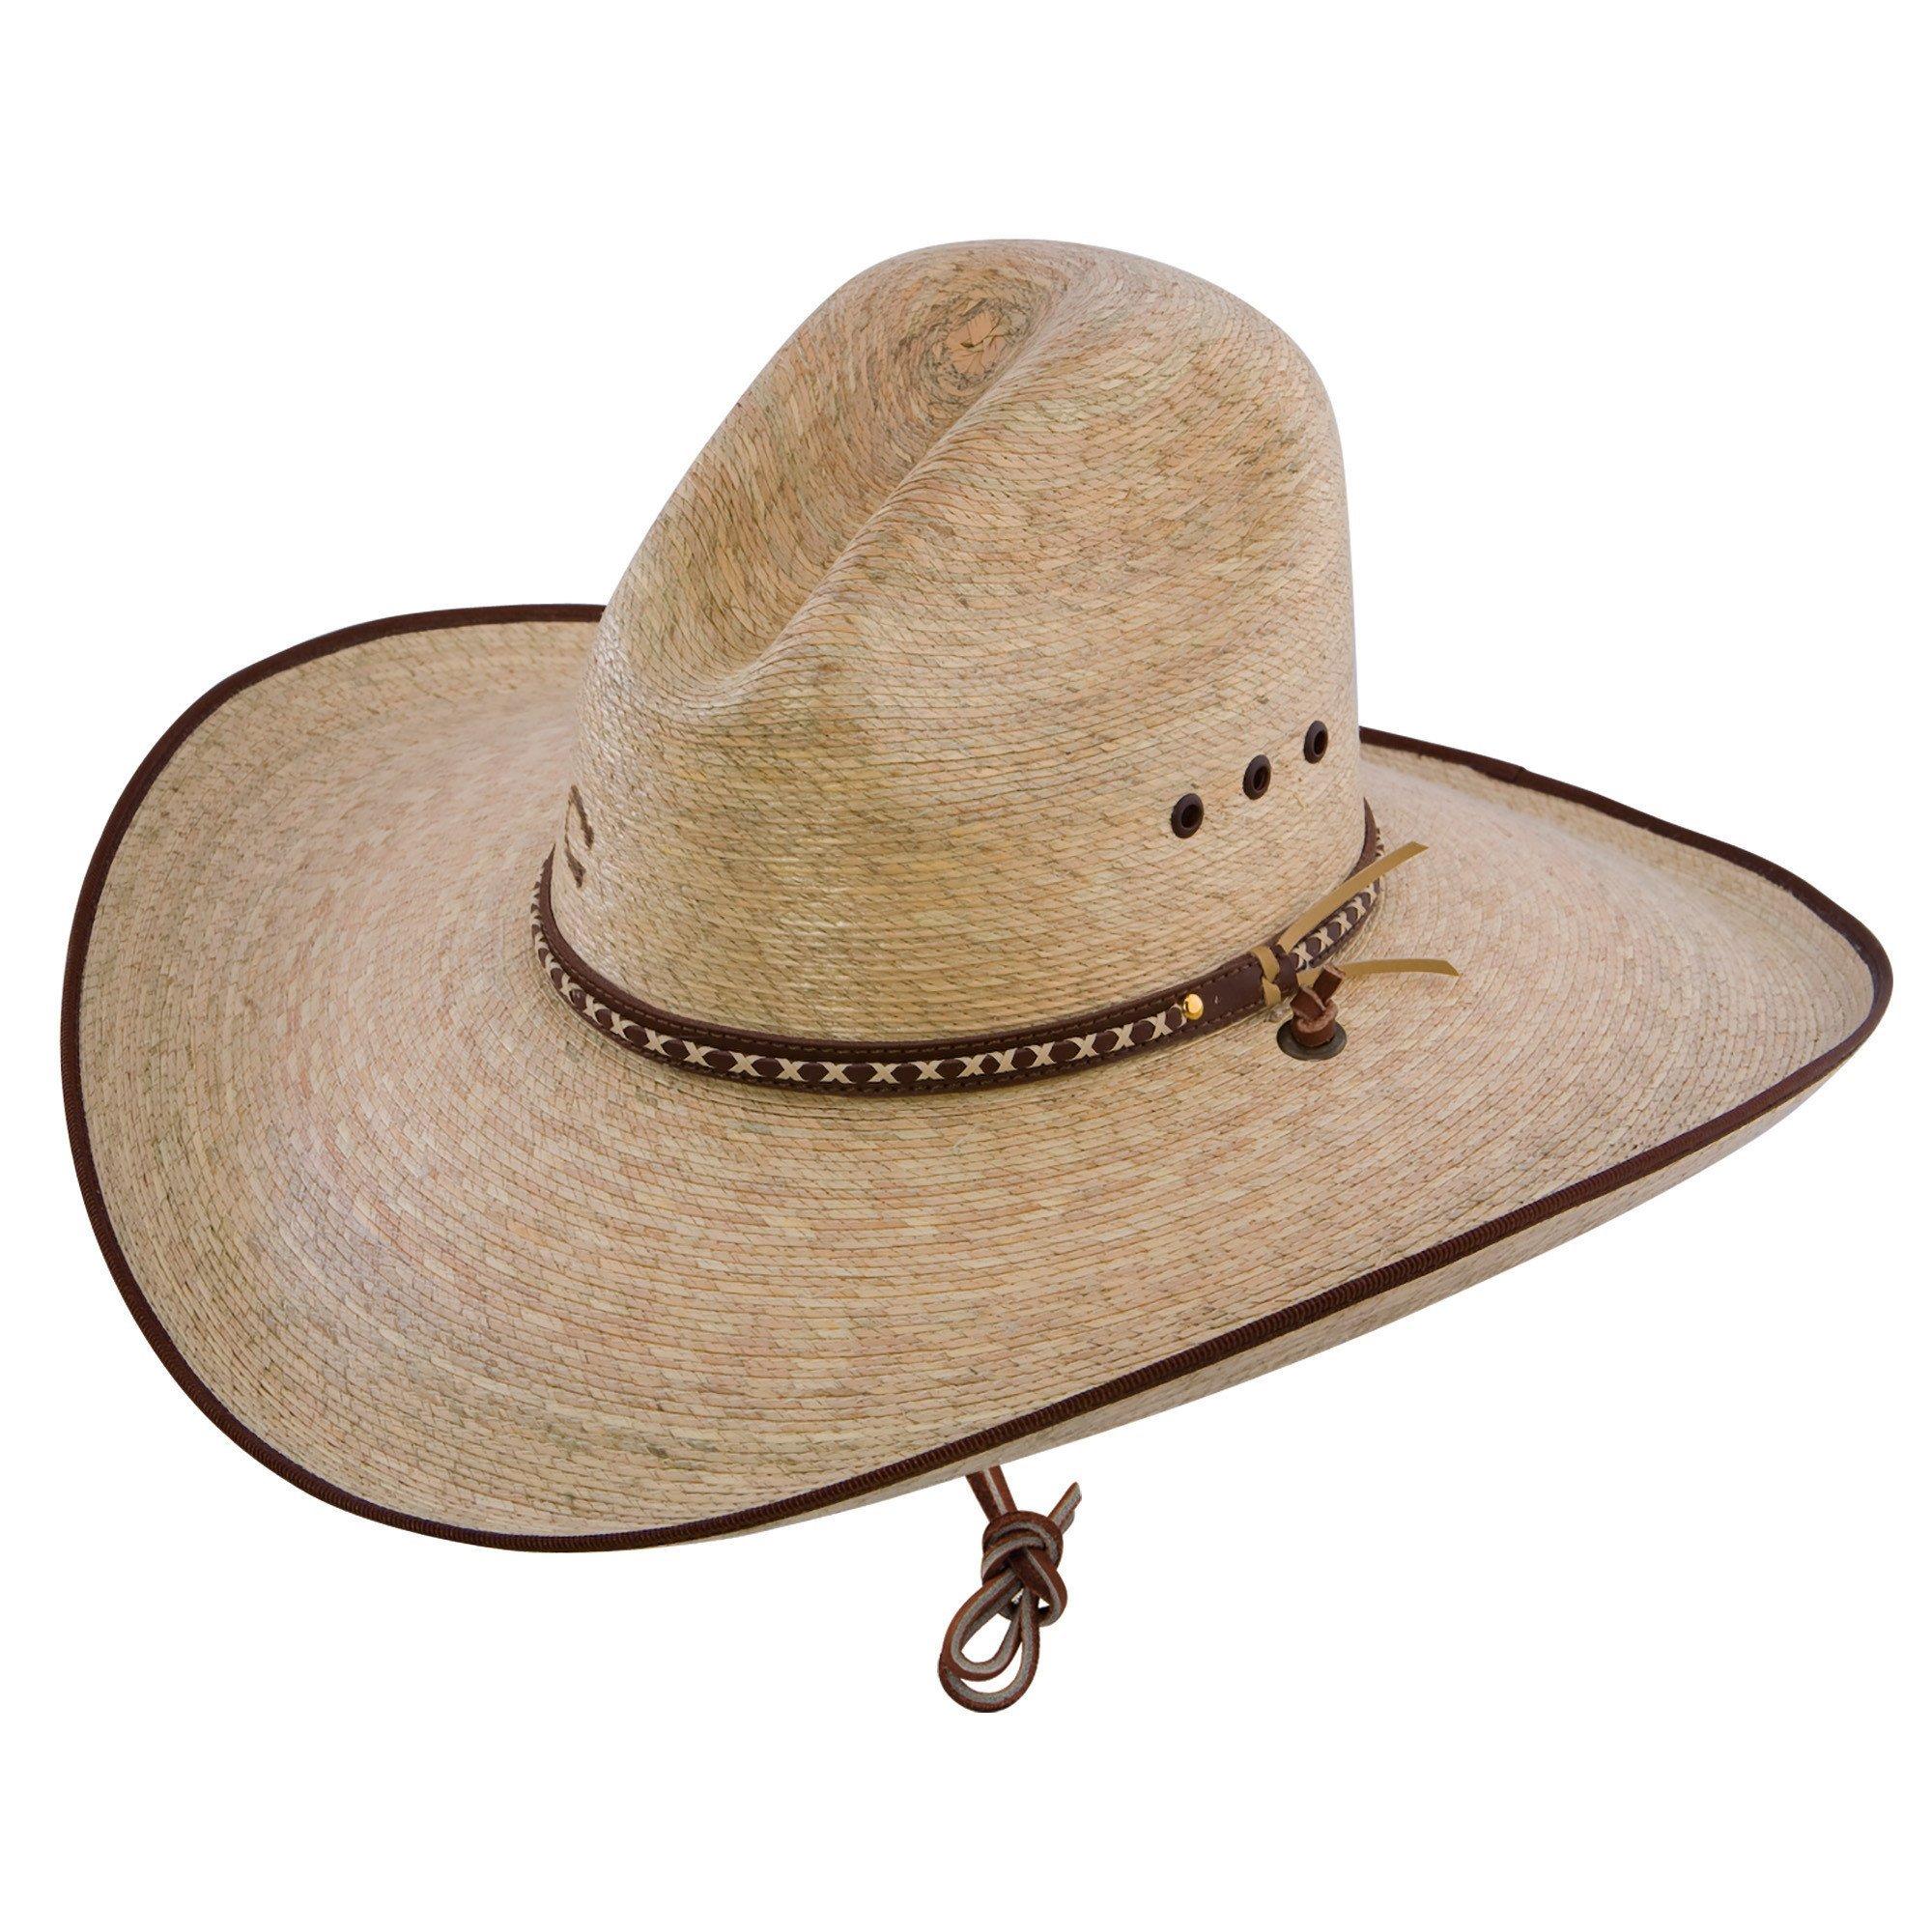 Charlie 1 Horse Bandito B Palm Straw Western Hat Item CSBNDTB9550